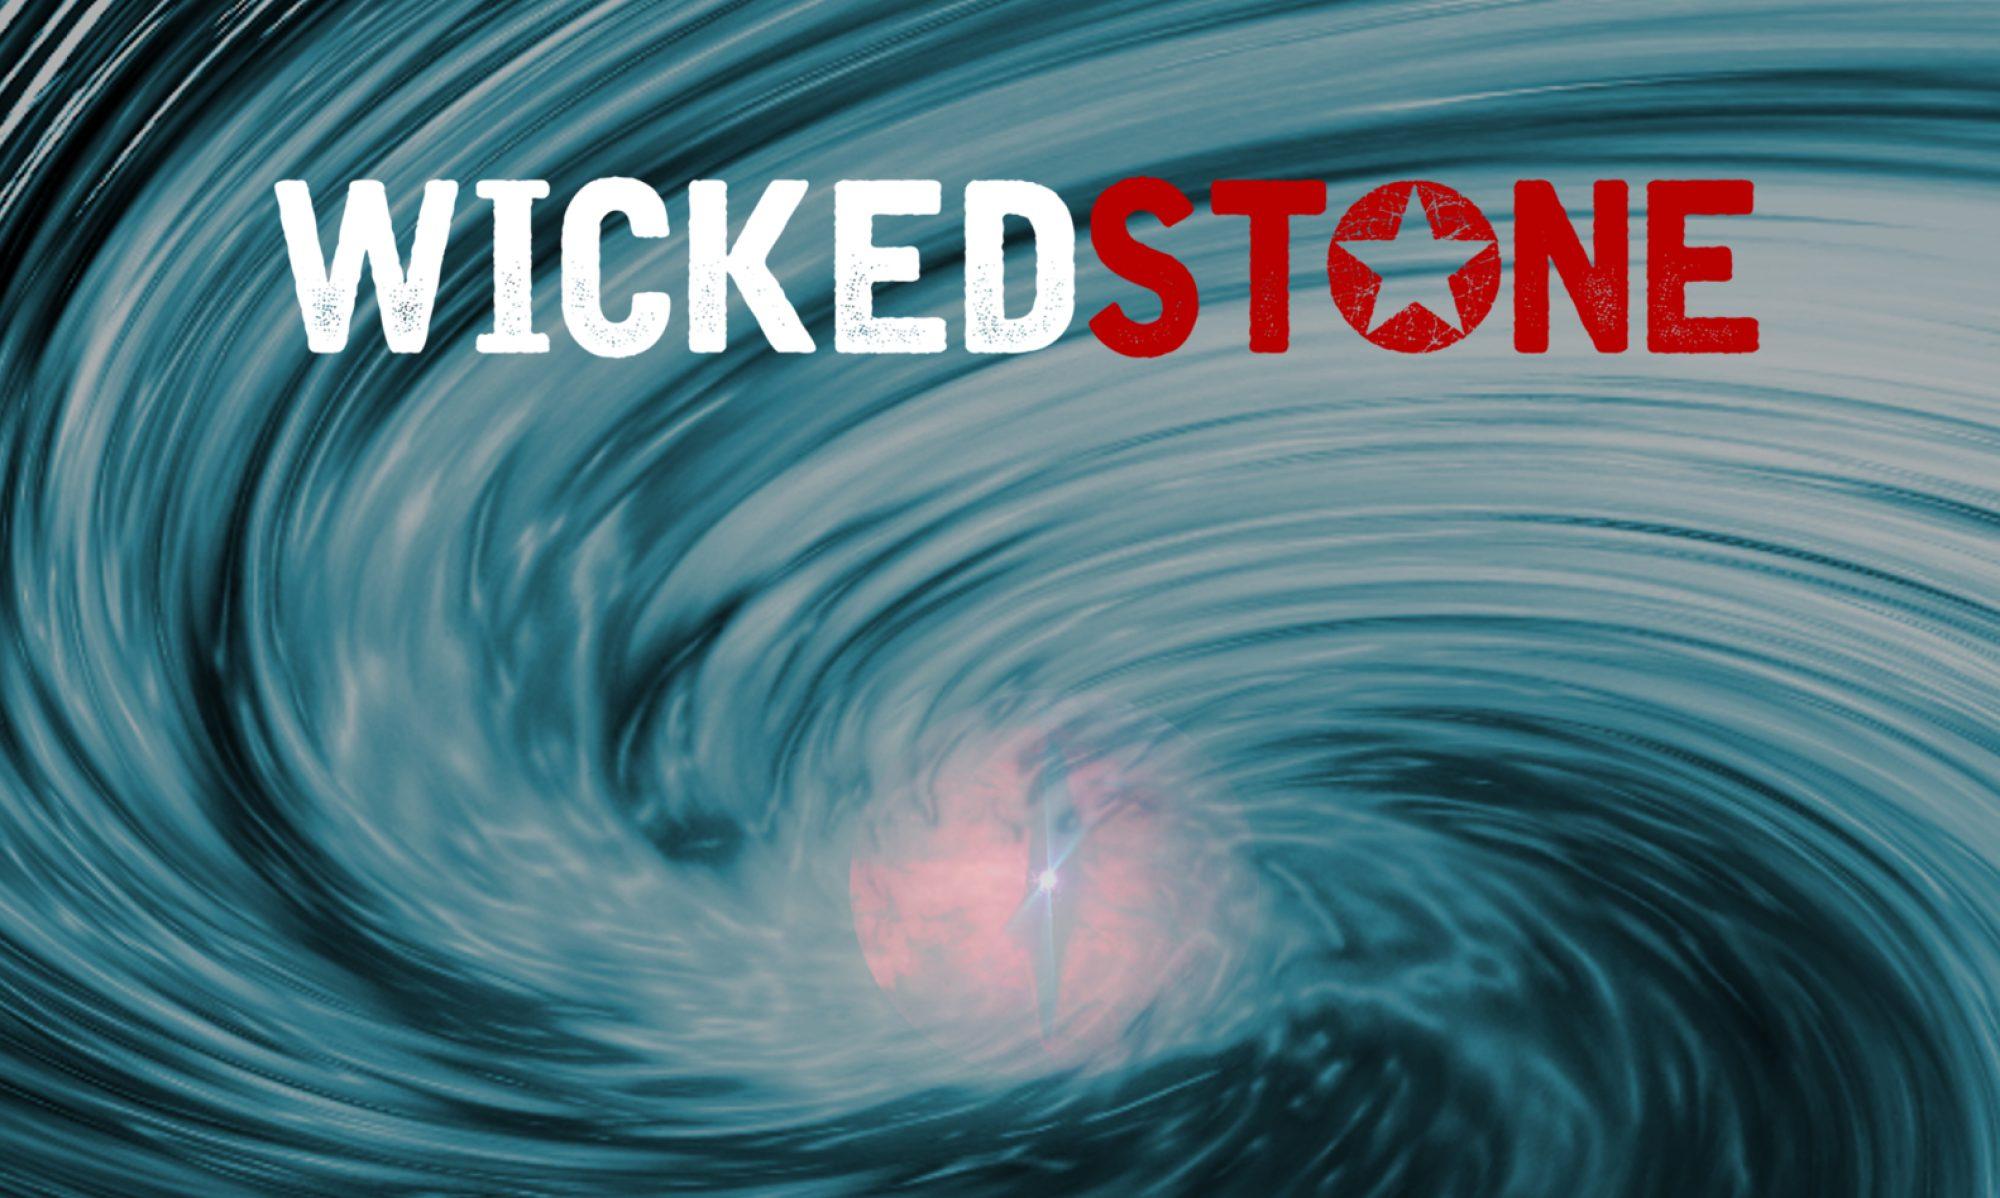 Wicked Stone